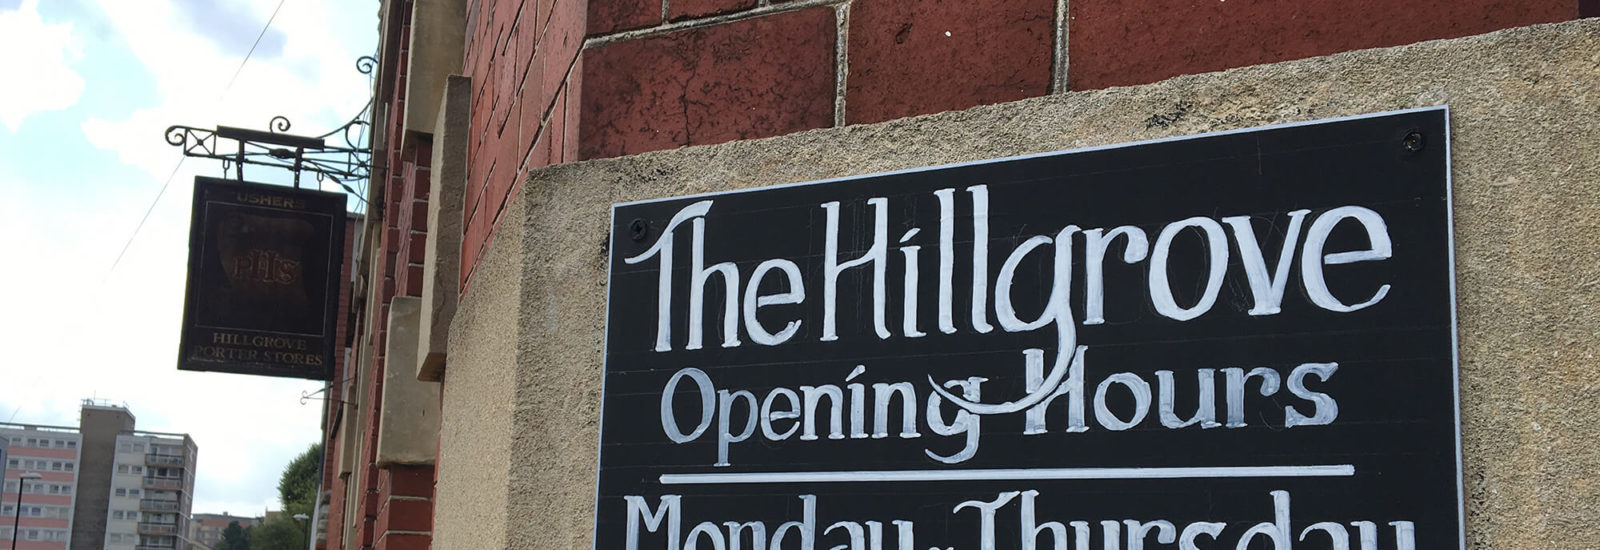 Image of Hillgrove Porter Stores